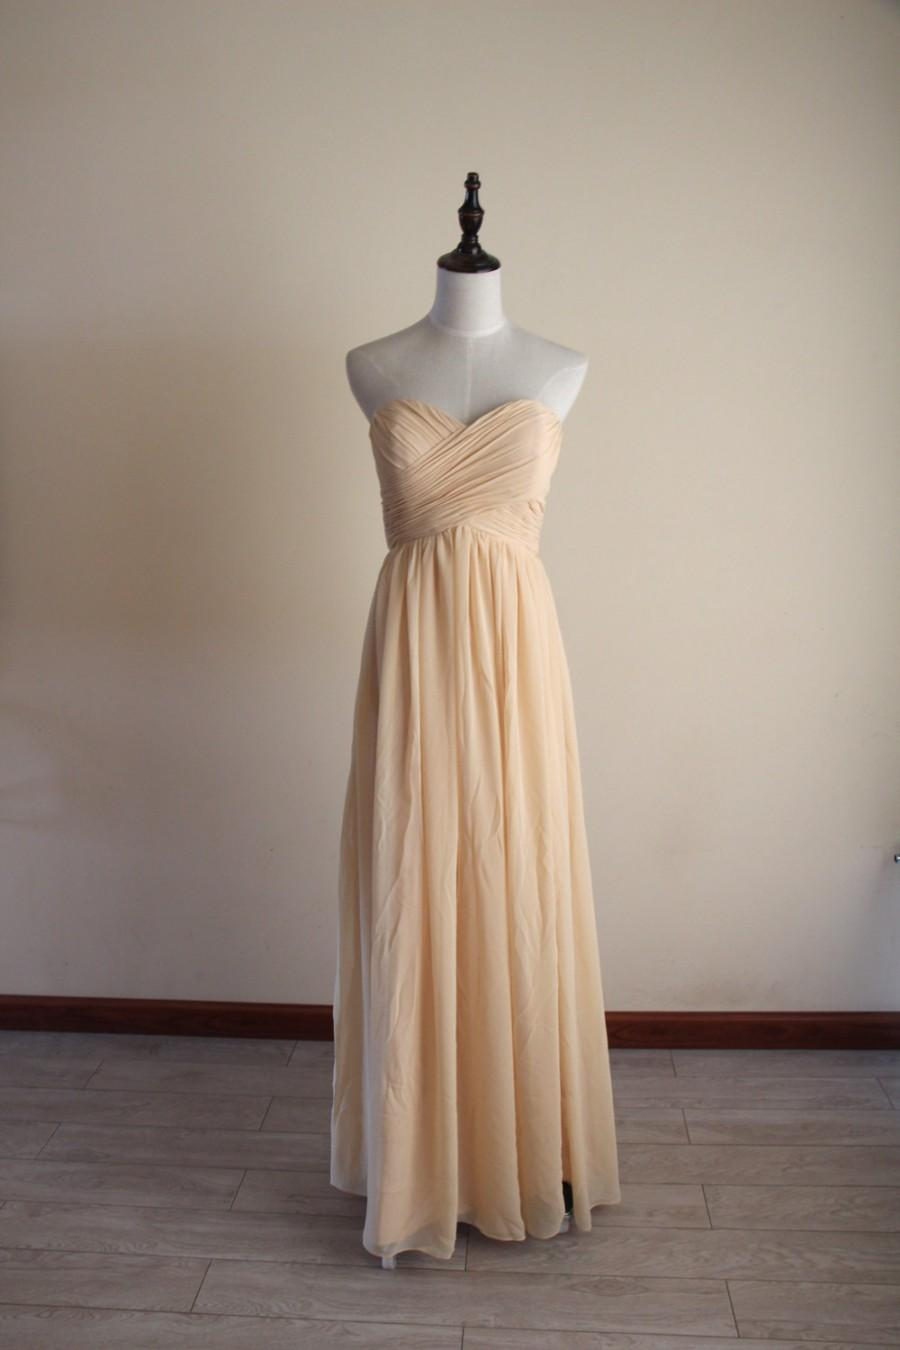 Mariage - Light Golden Bridesmaid Dress Floor-length Sweetheart Chiffon Light Gold Long Bridesmaid Dress-Custom Dress